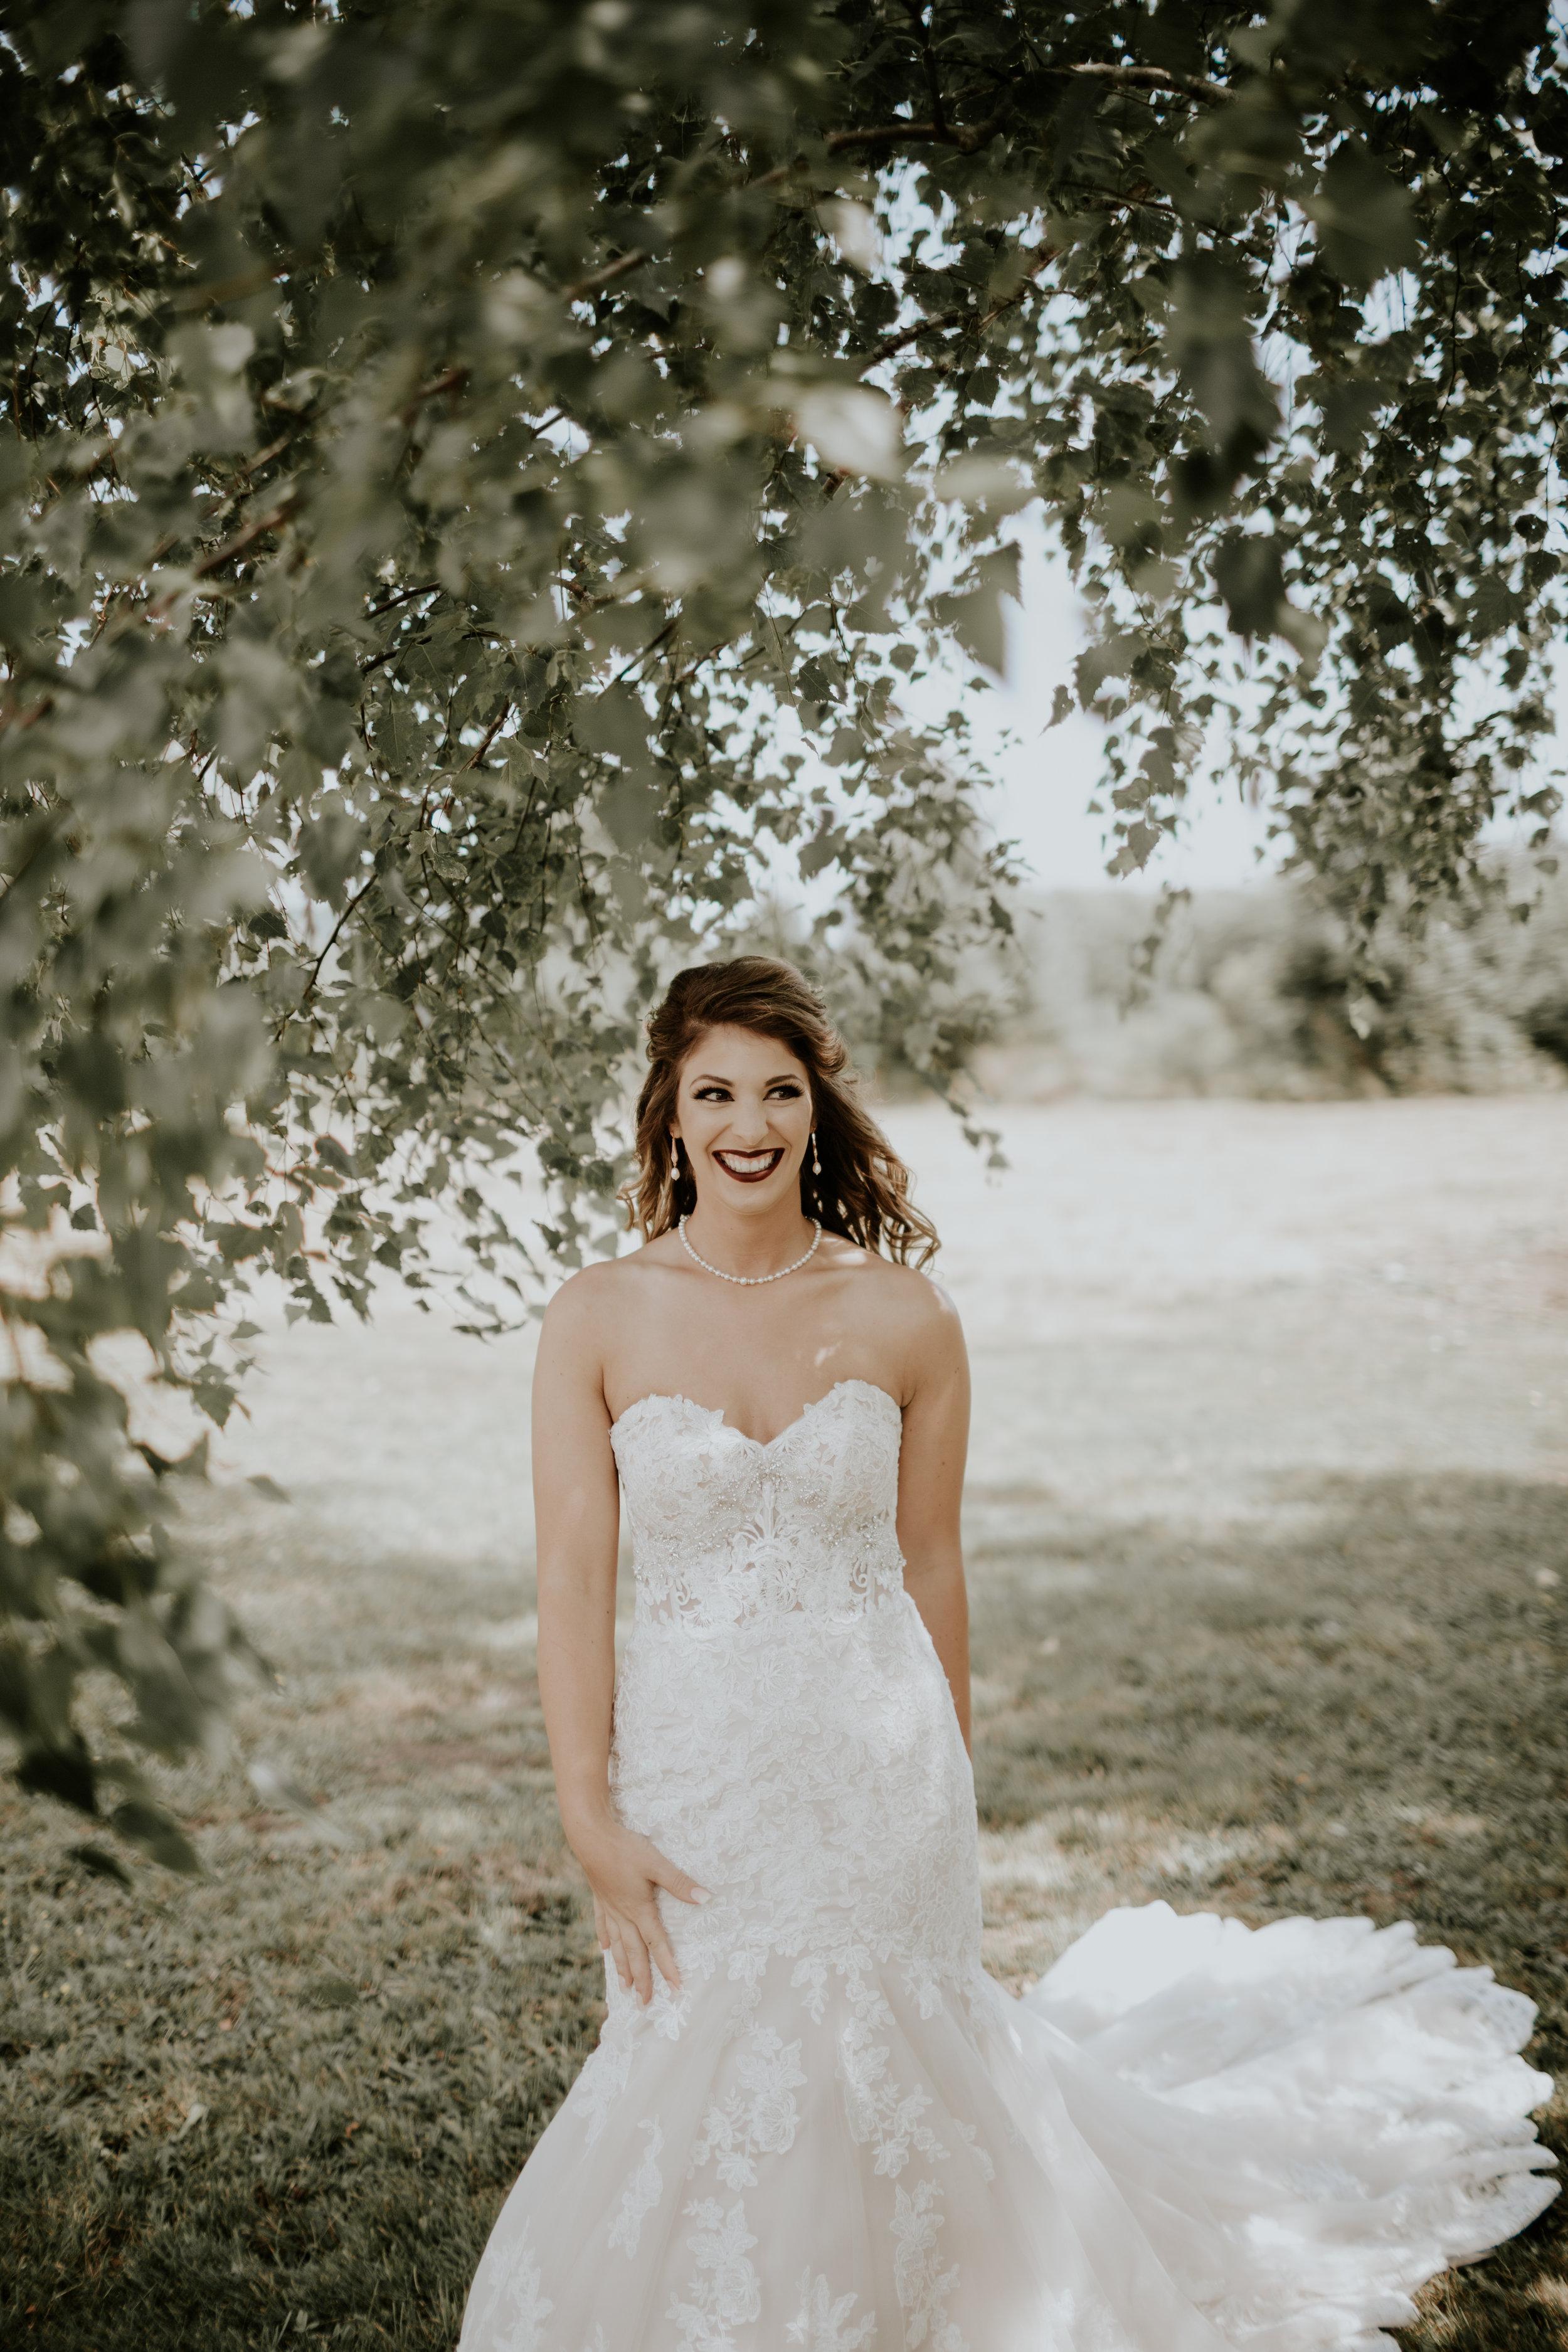 Olympic-Peninsula-Wedding-Photographer-PNW-Forks-Port-Angeles-Kayla-Dawn-Photography-engagement-Olympic-National-Park-116.jpg